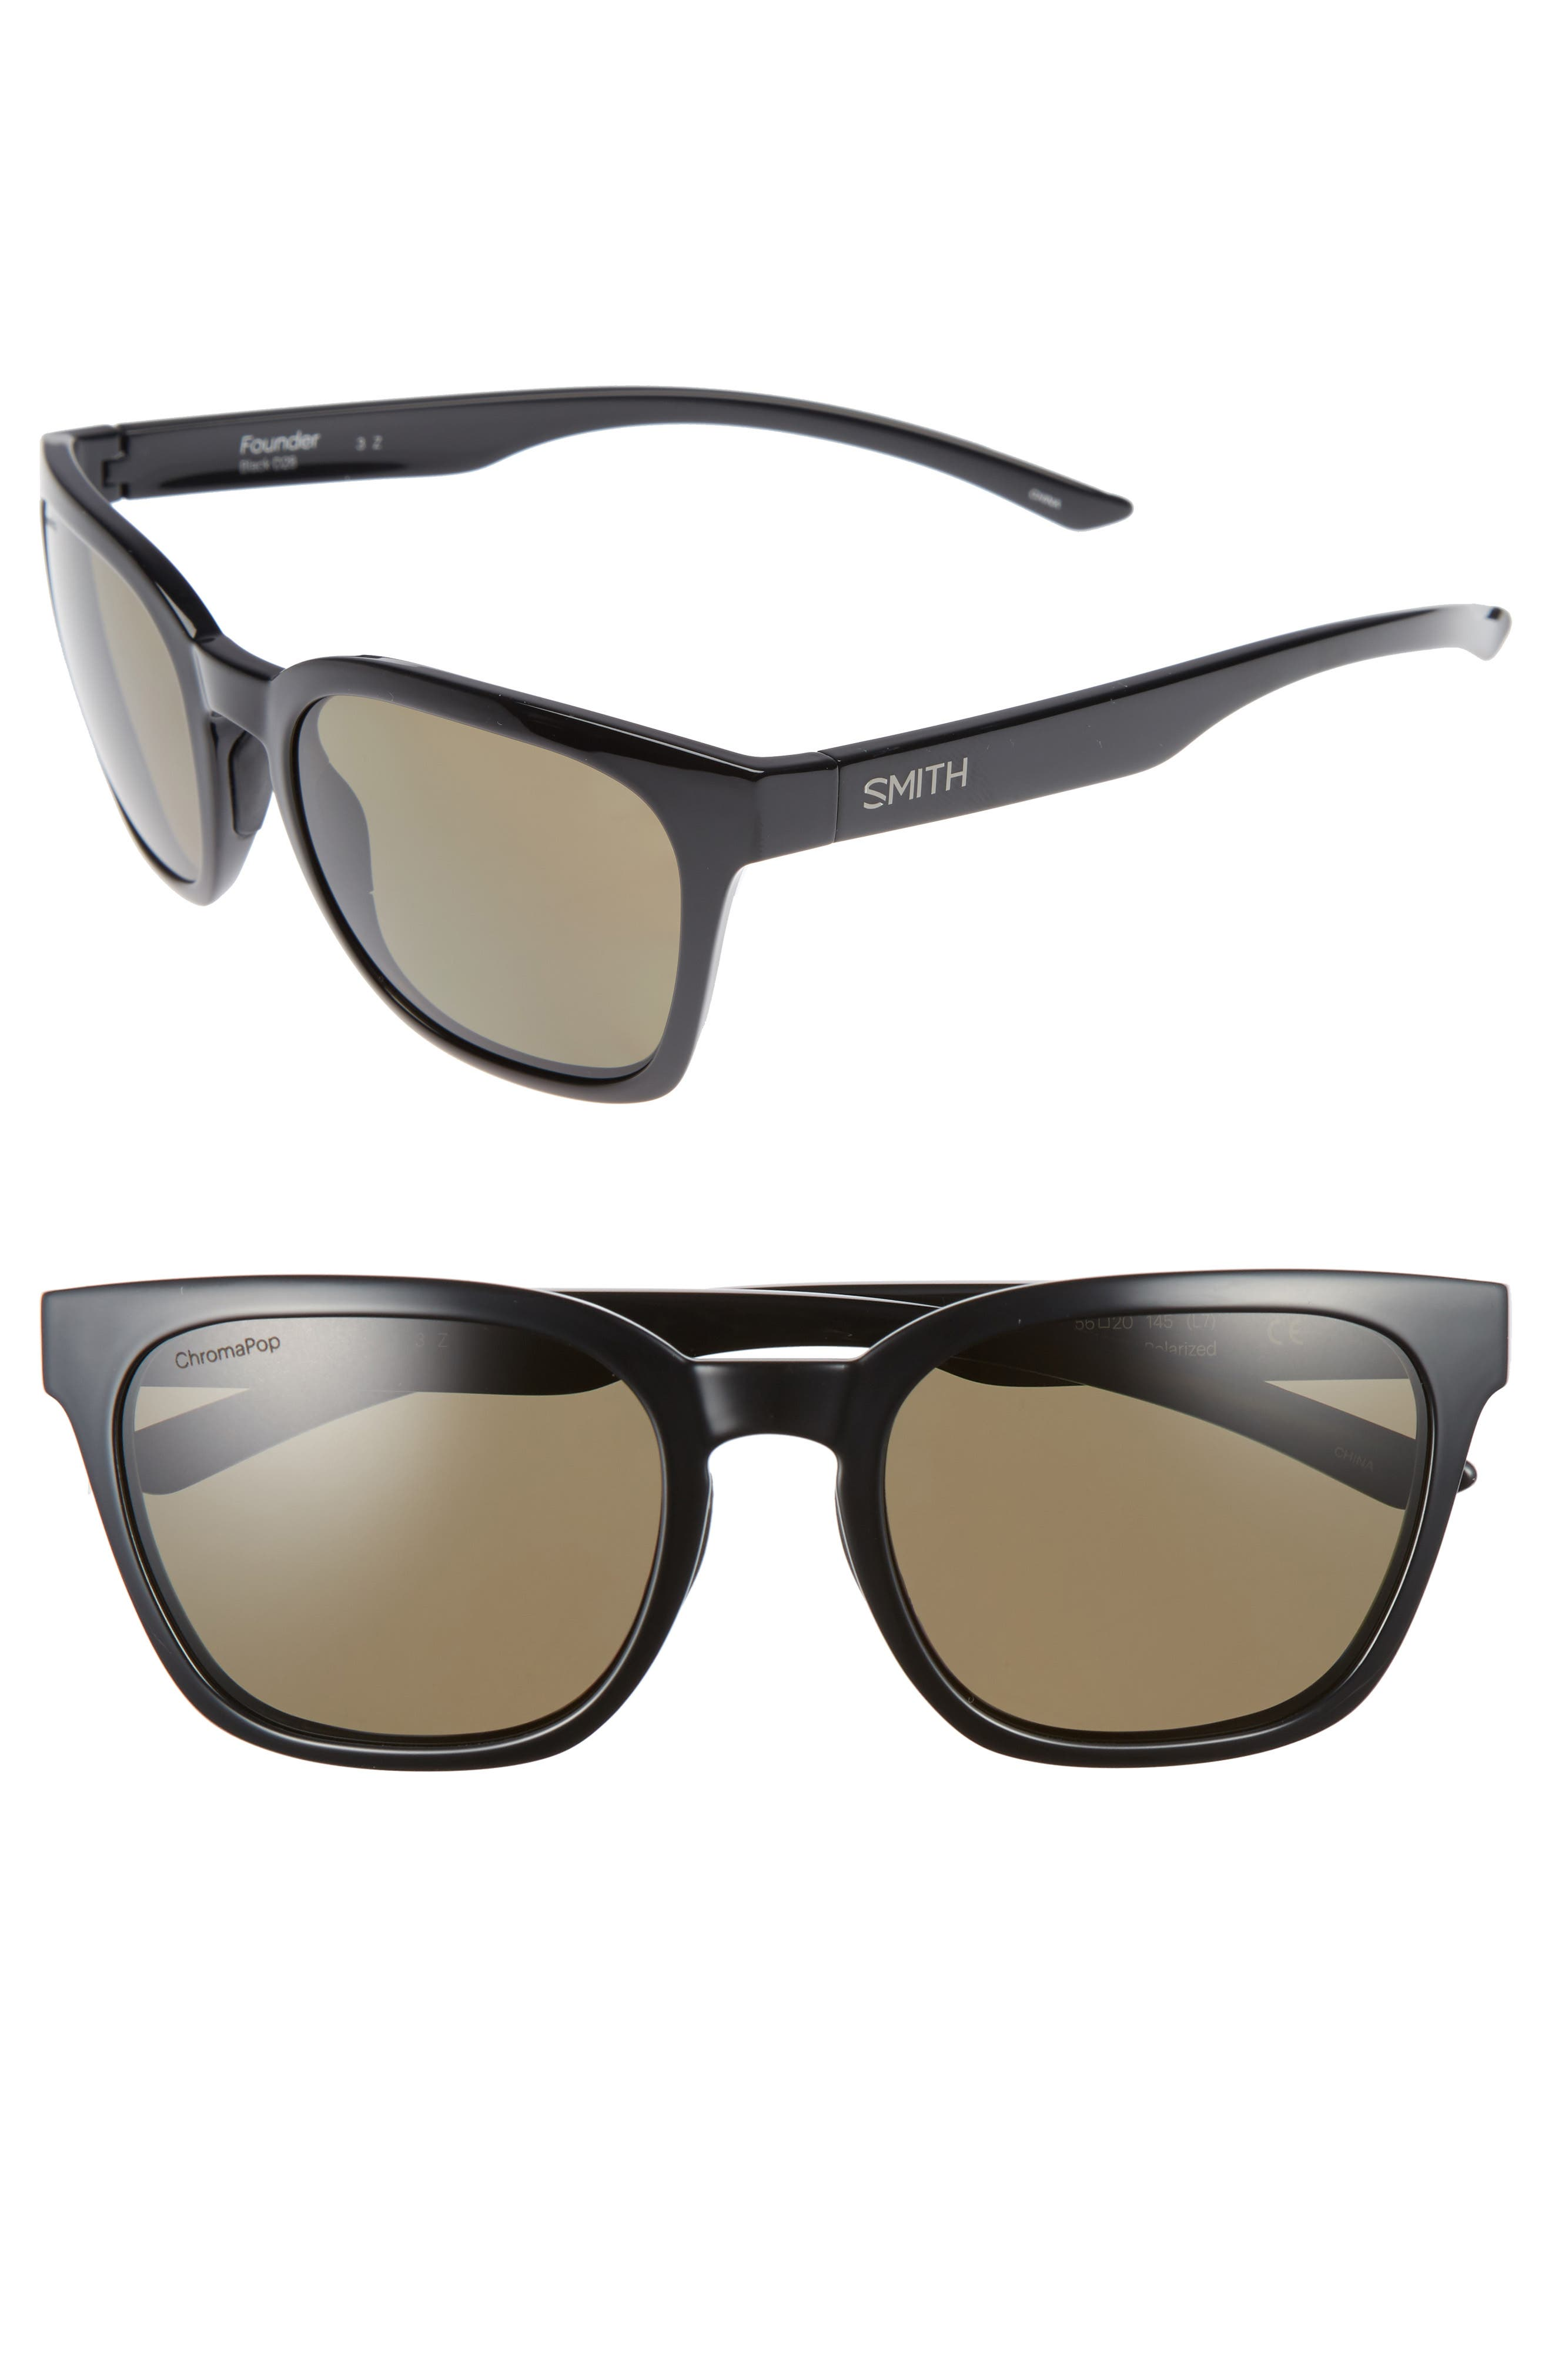 Founder 55mm ChromaPop<sup>™</sup> Polarized Sunglasses,                             Main thumbnail 1, color,                             Black/ Gray Green